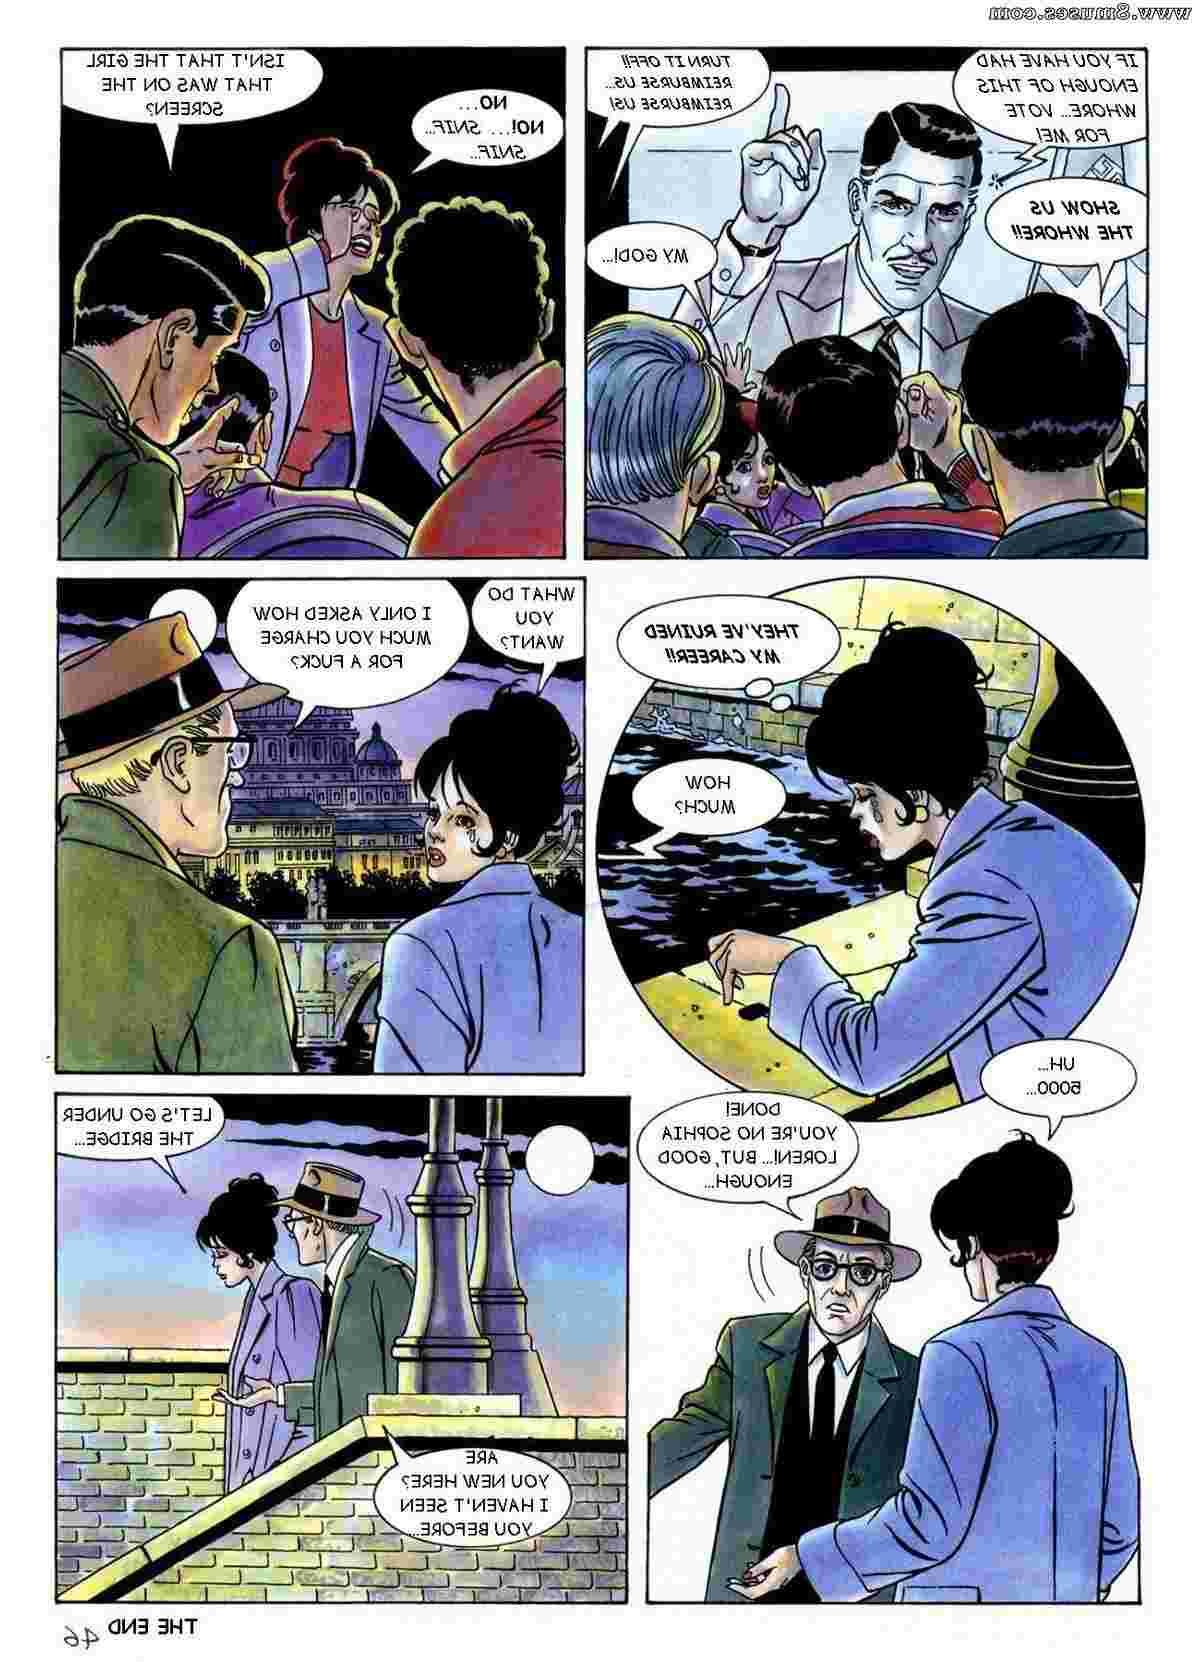 Stramaglia-Morale-Comics/Anna-Perverted-Innocence Anna_Perverted_Innocence__8muses_-_Sex_and_Porn_Comics_49.jpg